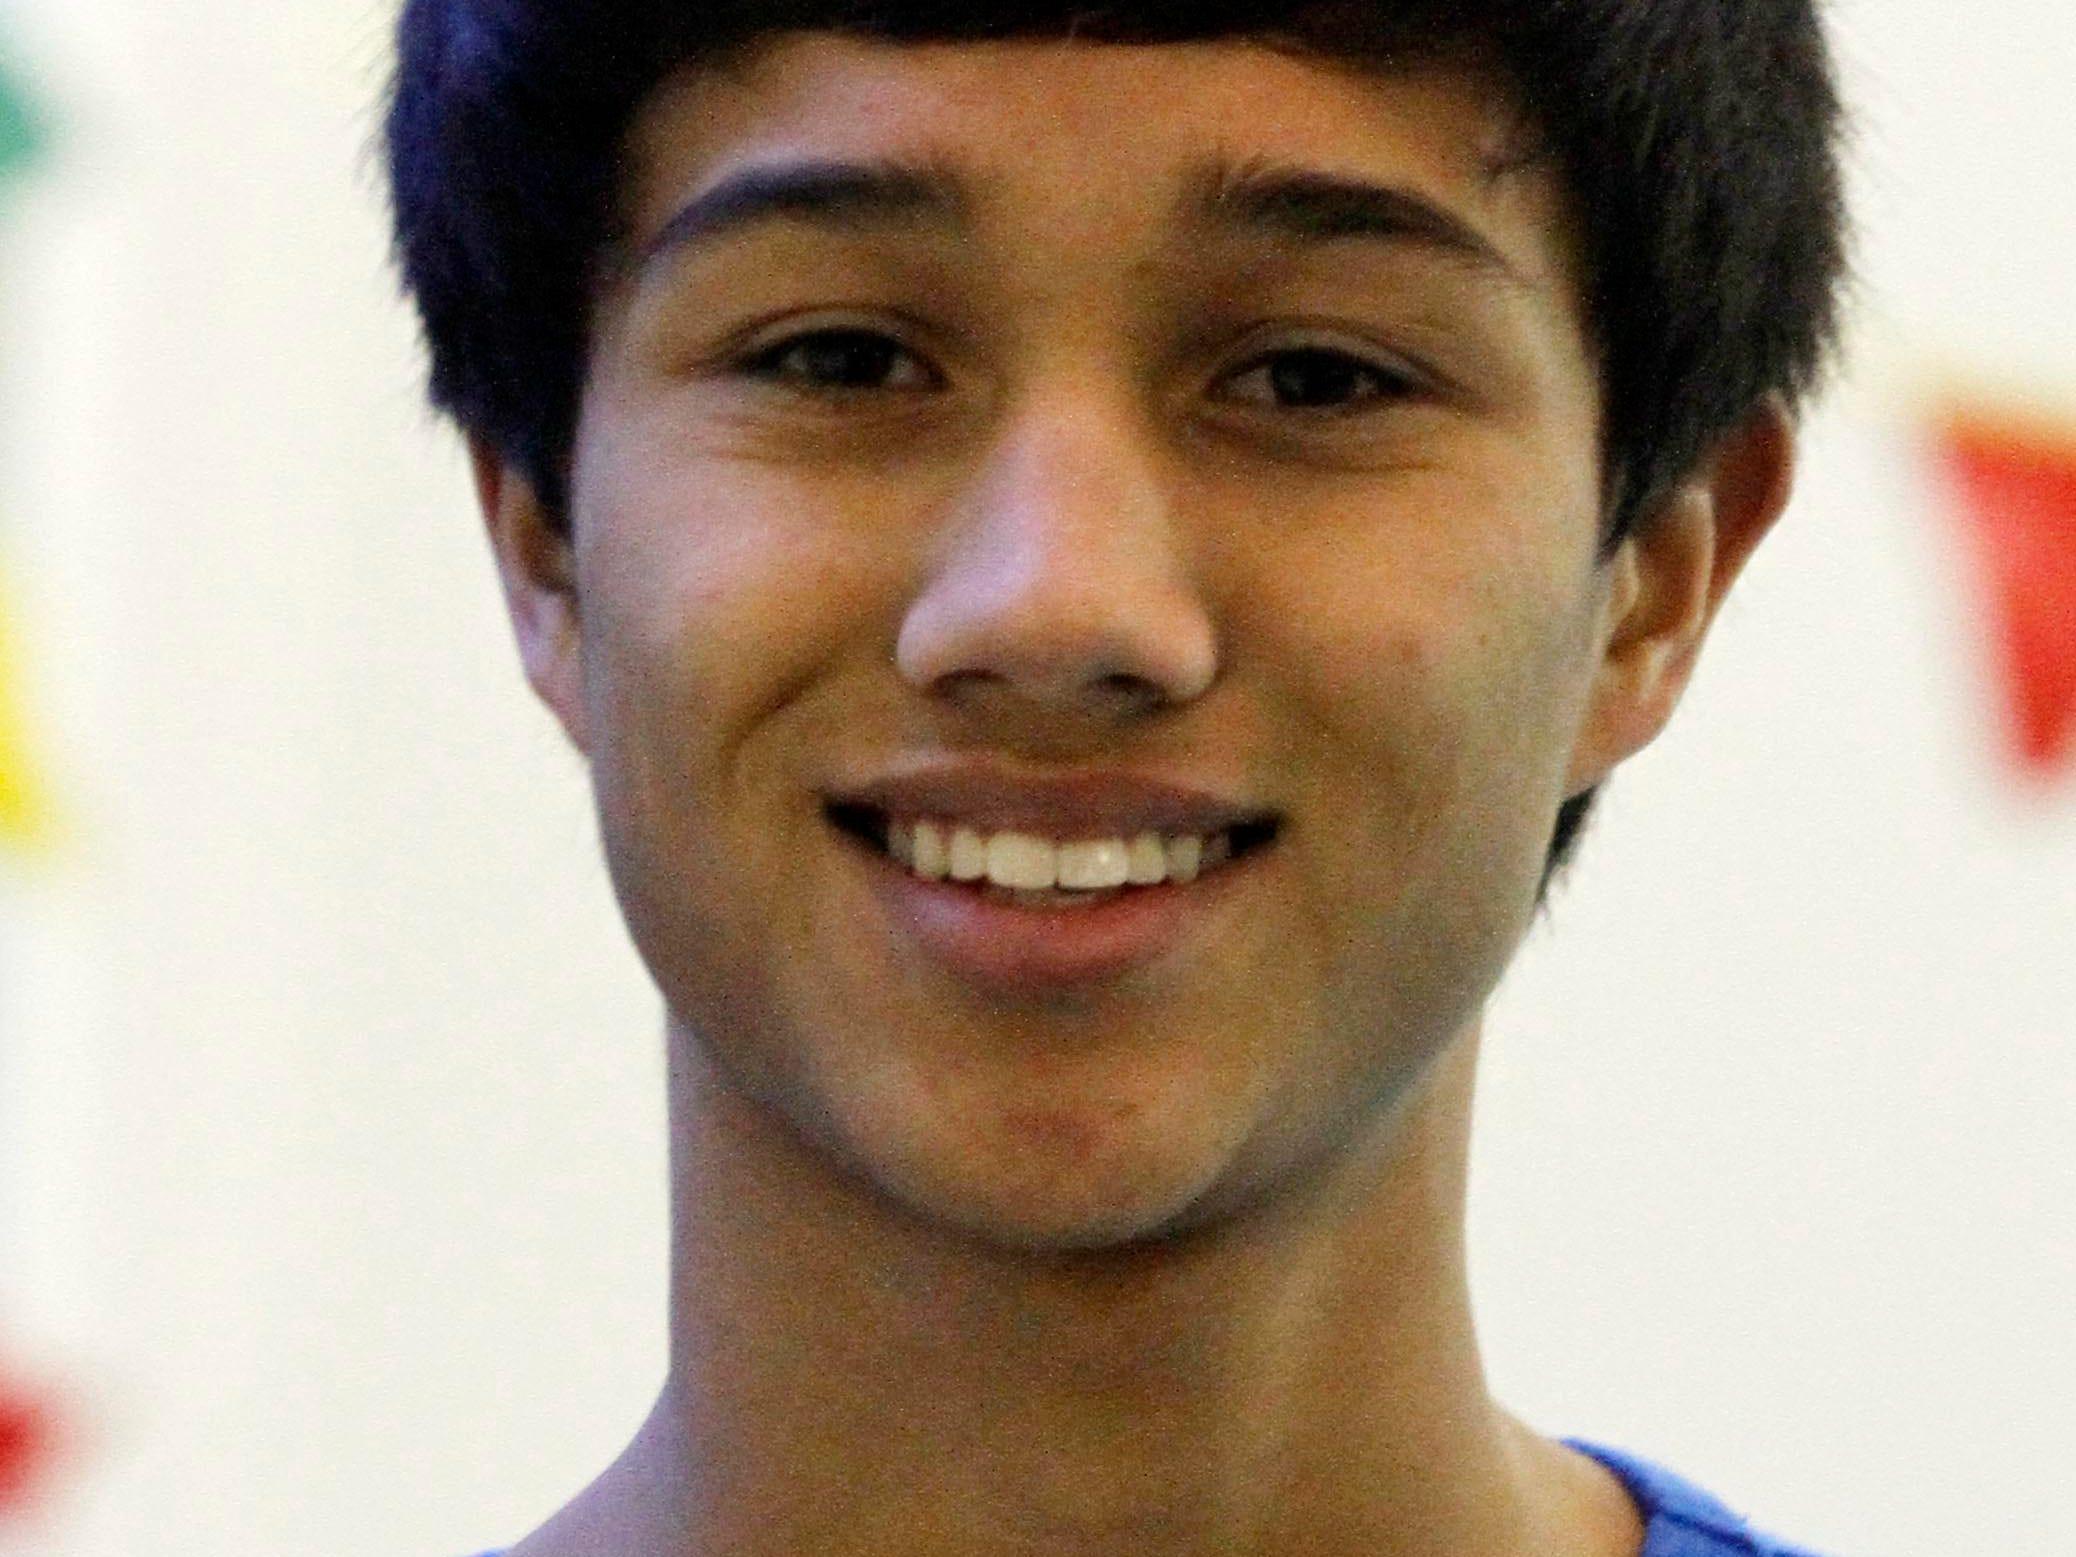 Salem Academy sophomore Jonah Leutwyler during swim practice Friday Dec. 20, 2013.